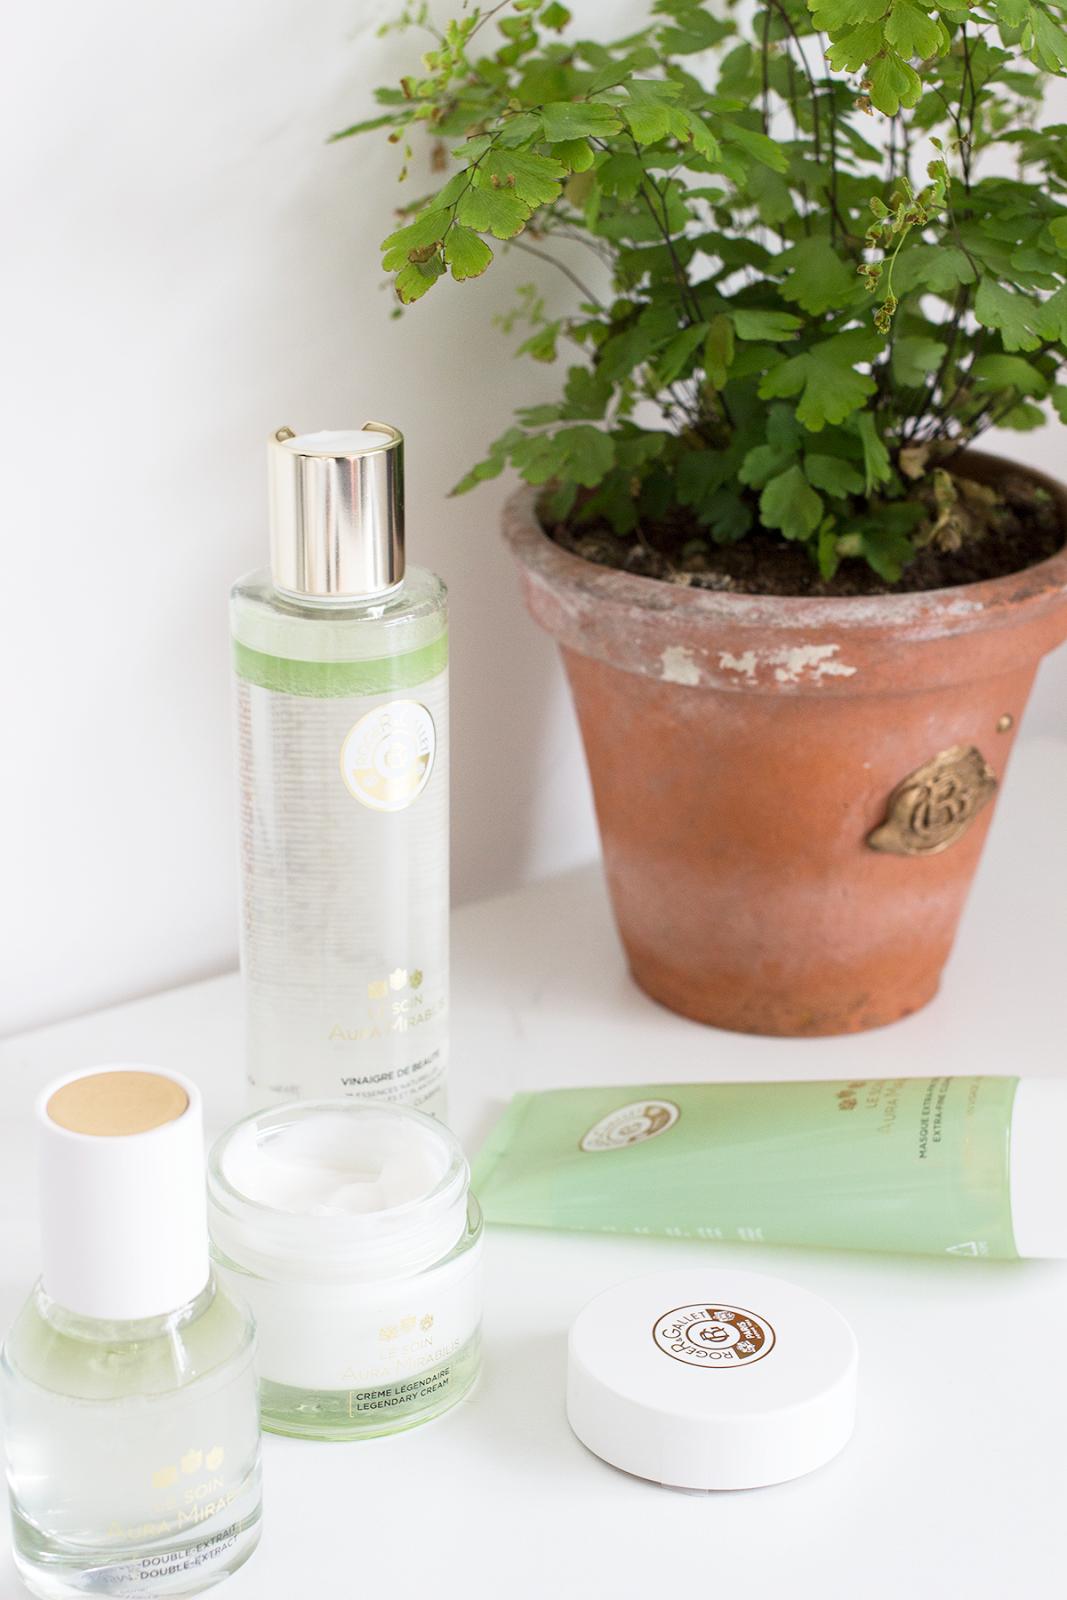 Roger & Gallet Le Soin Aura Mirabilis skincare range review